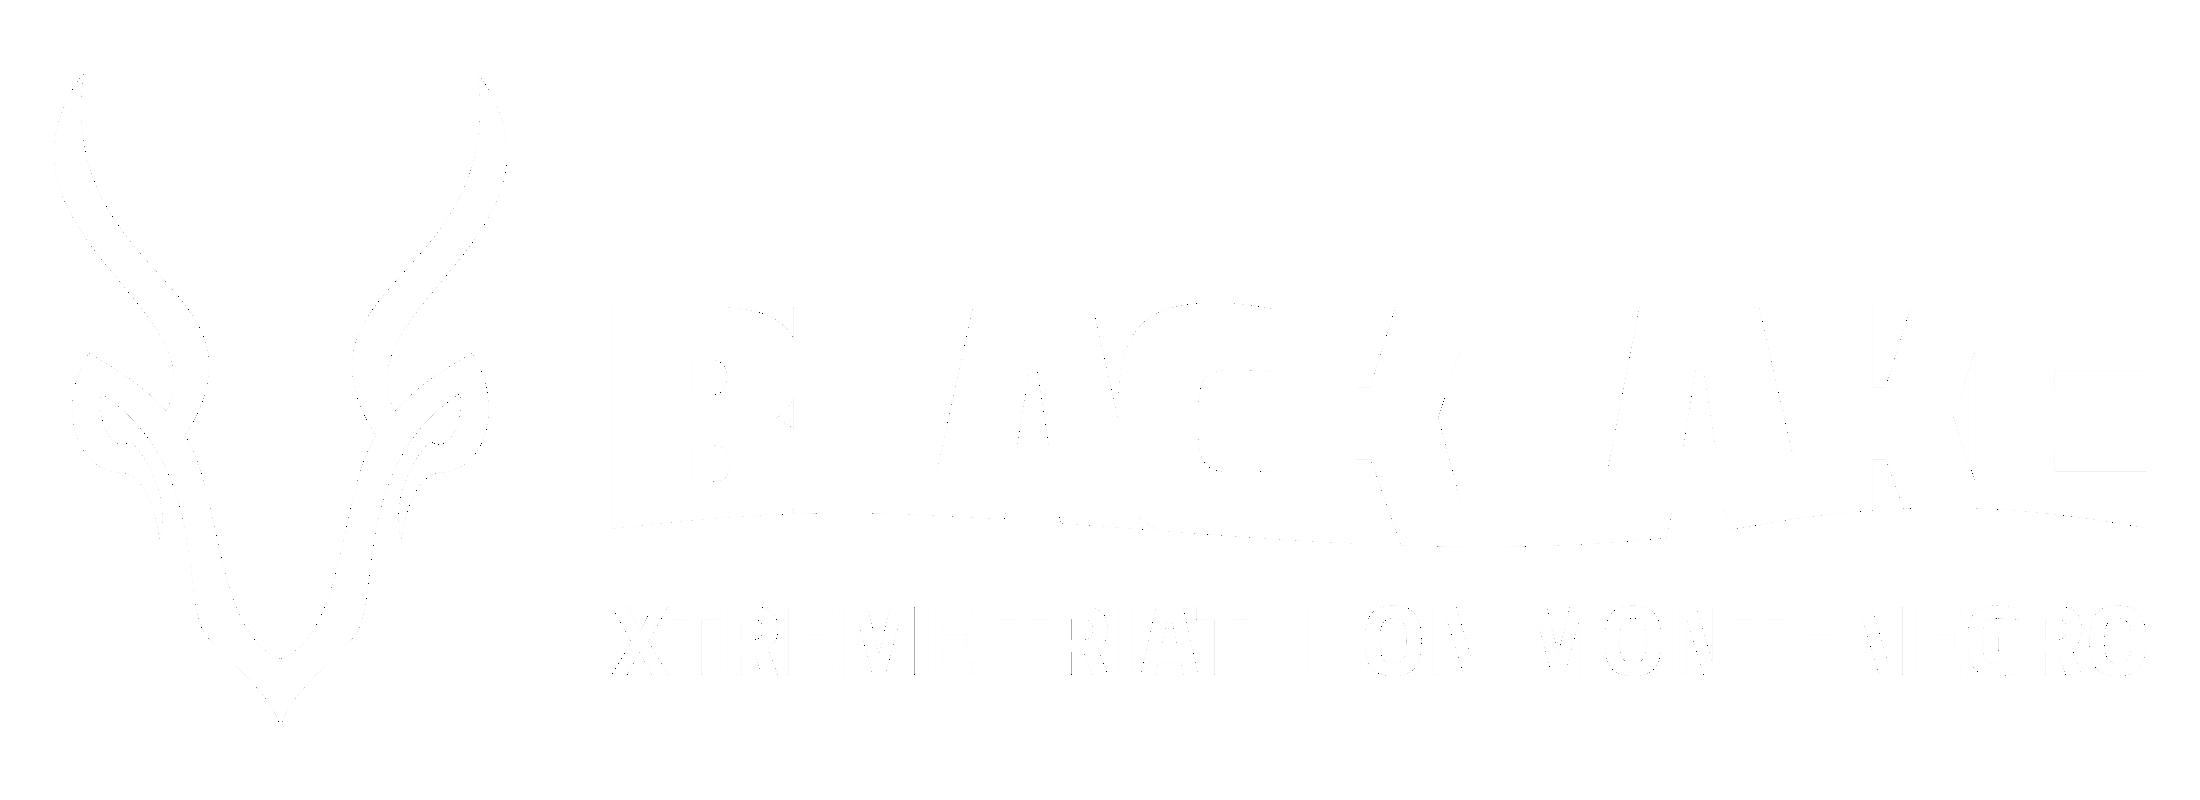 BLACKLAKE horizontalni white.png